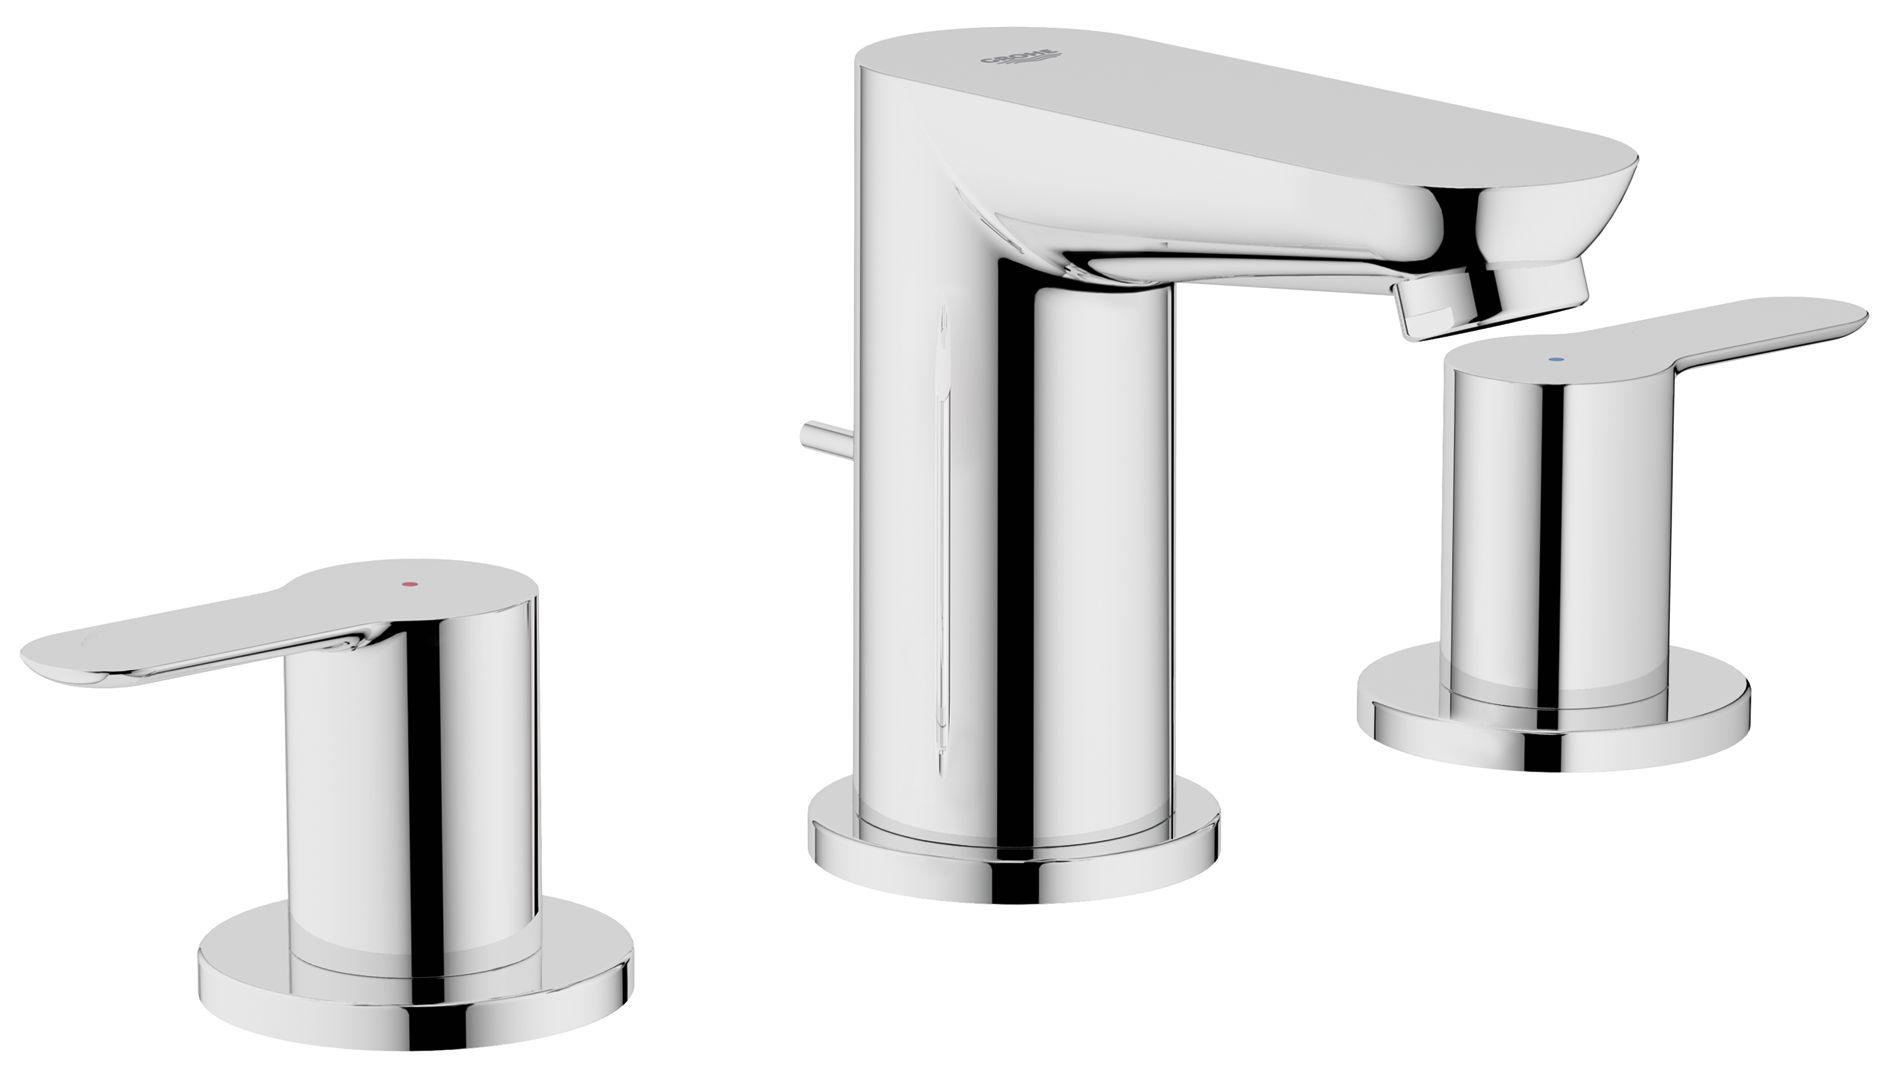 BauEdge 3-hole basin mixer